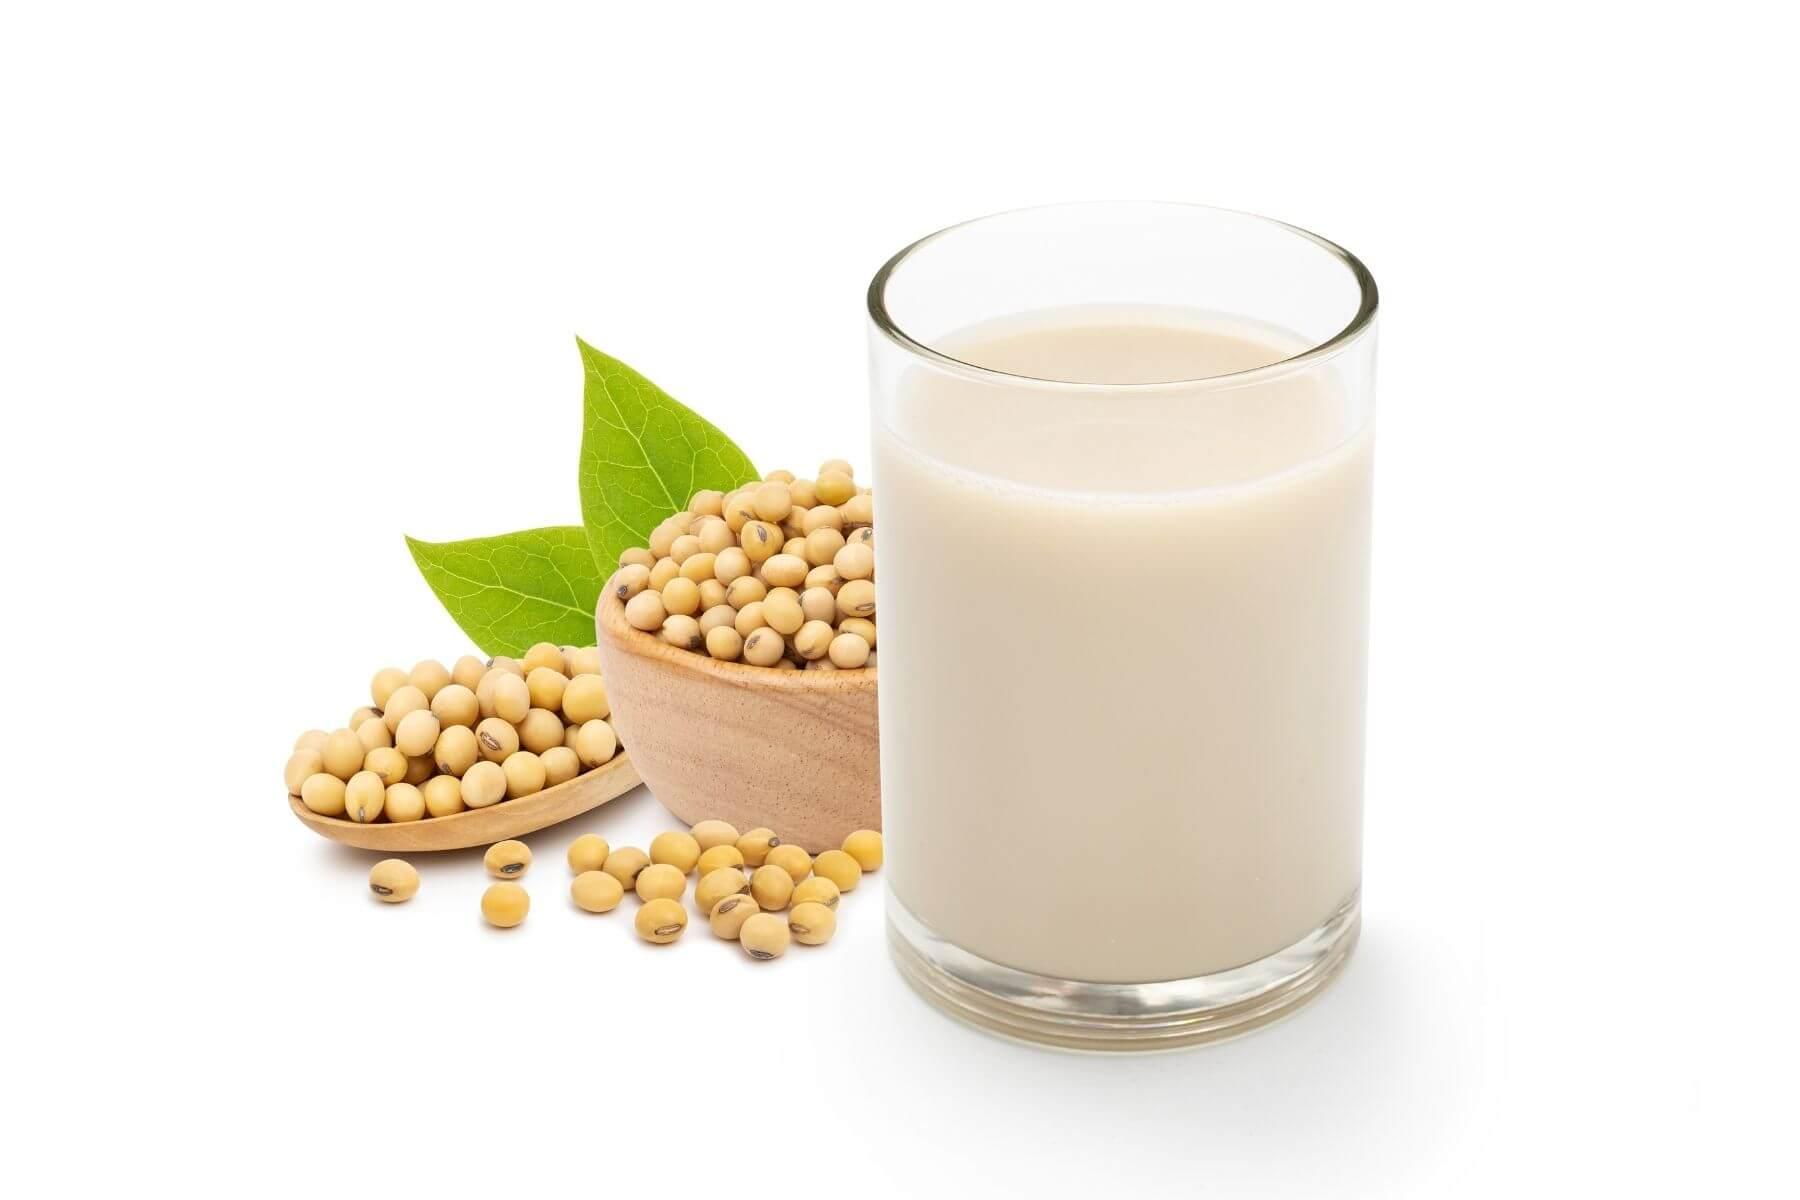 HappyFresh_How_To_Make_Homemade_Soy_Milk_Health_Benefits